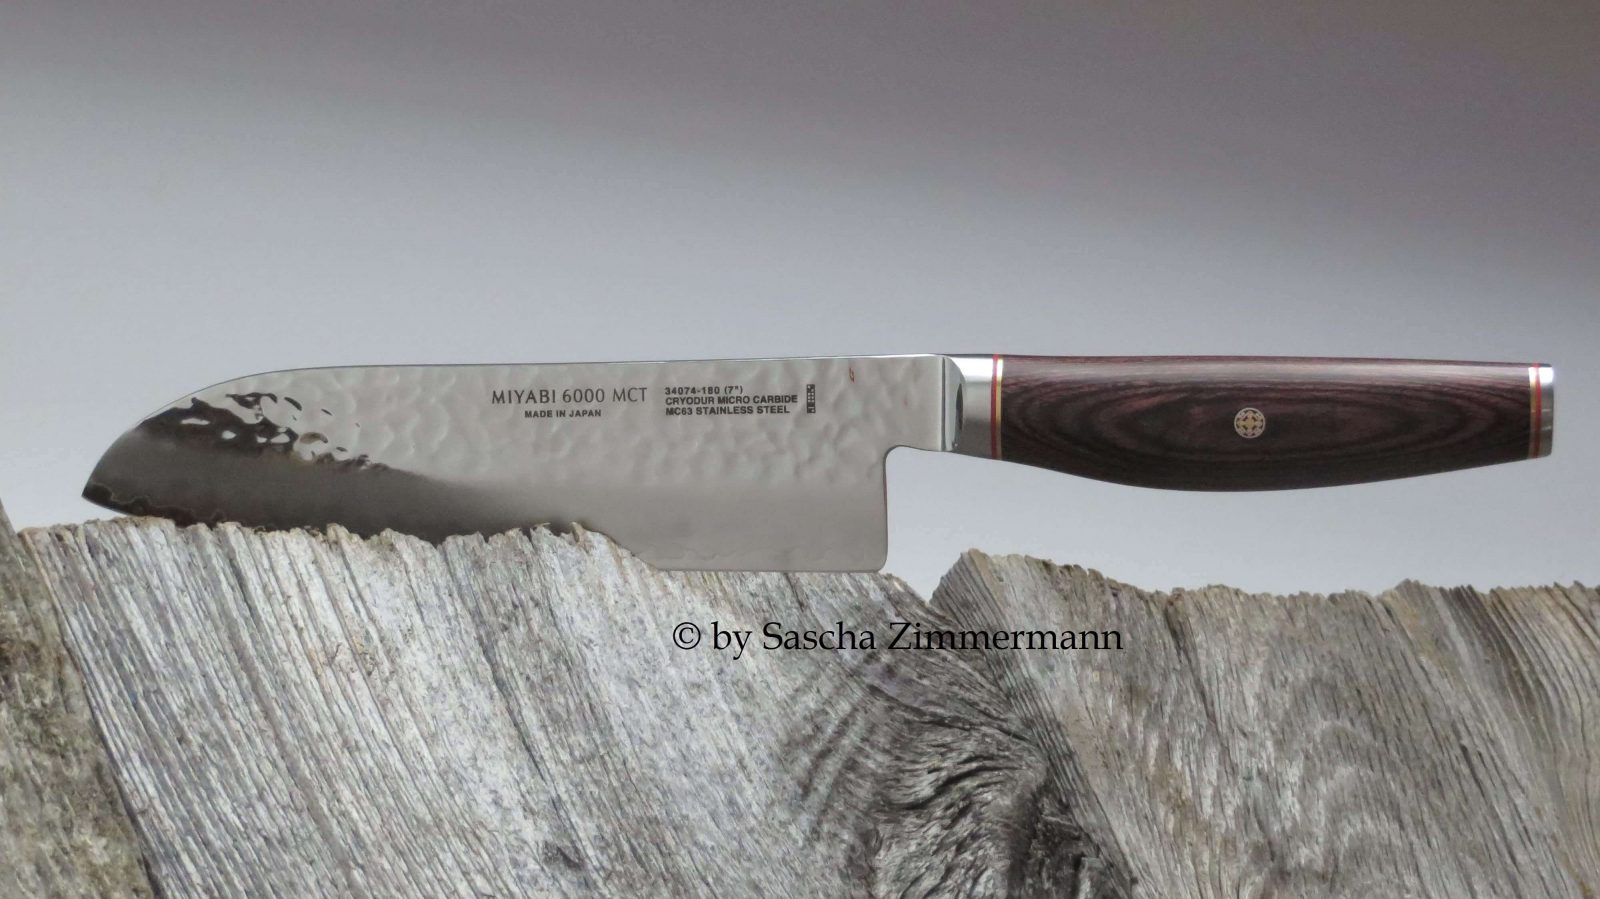 Miyabi Santoku Damastmesser 15 18cm